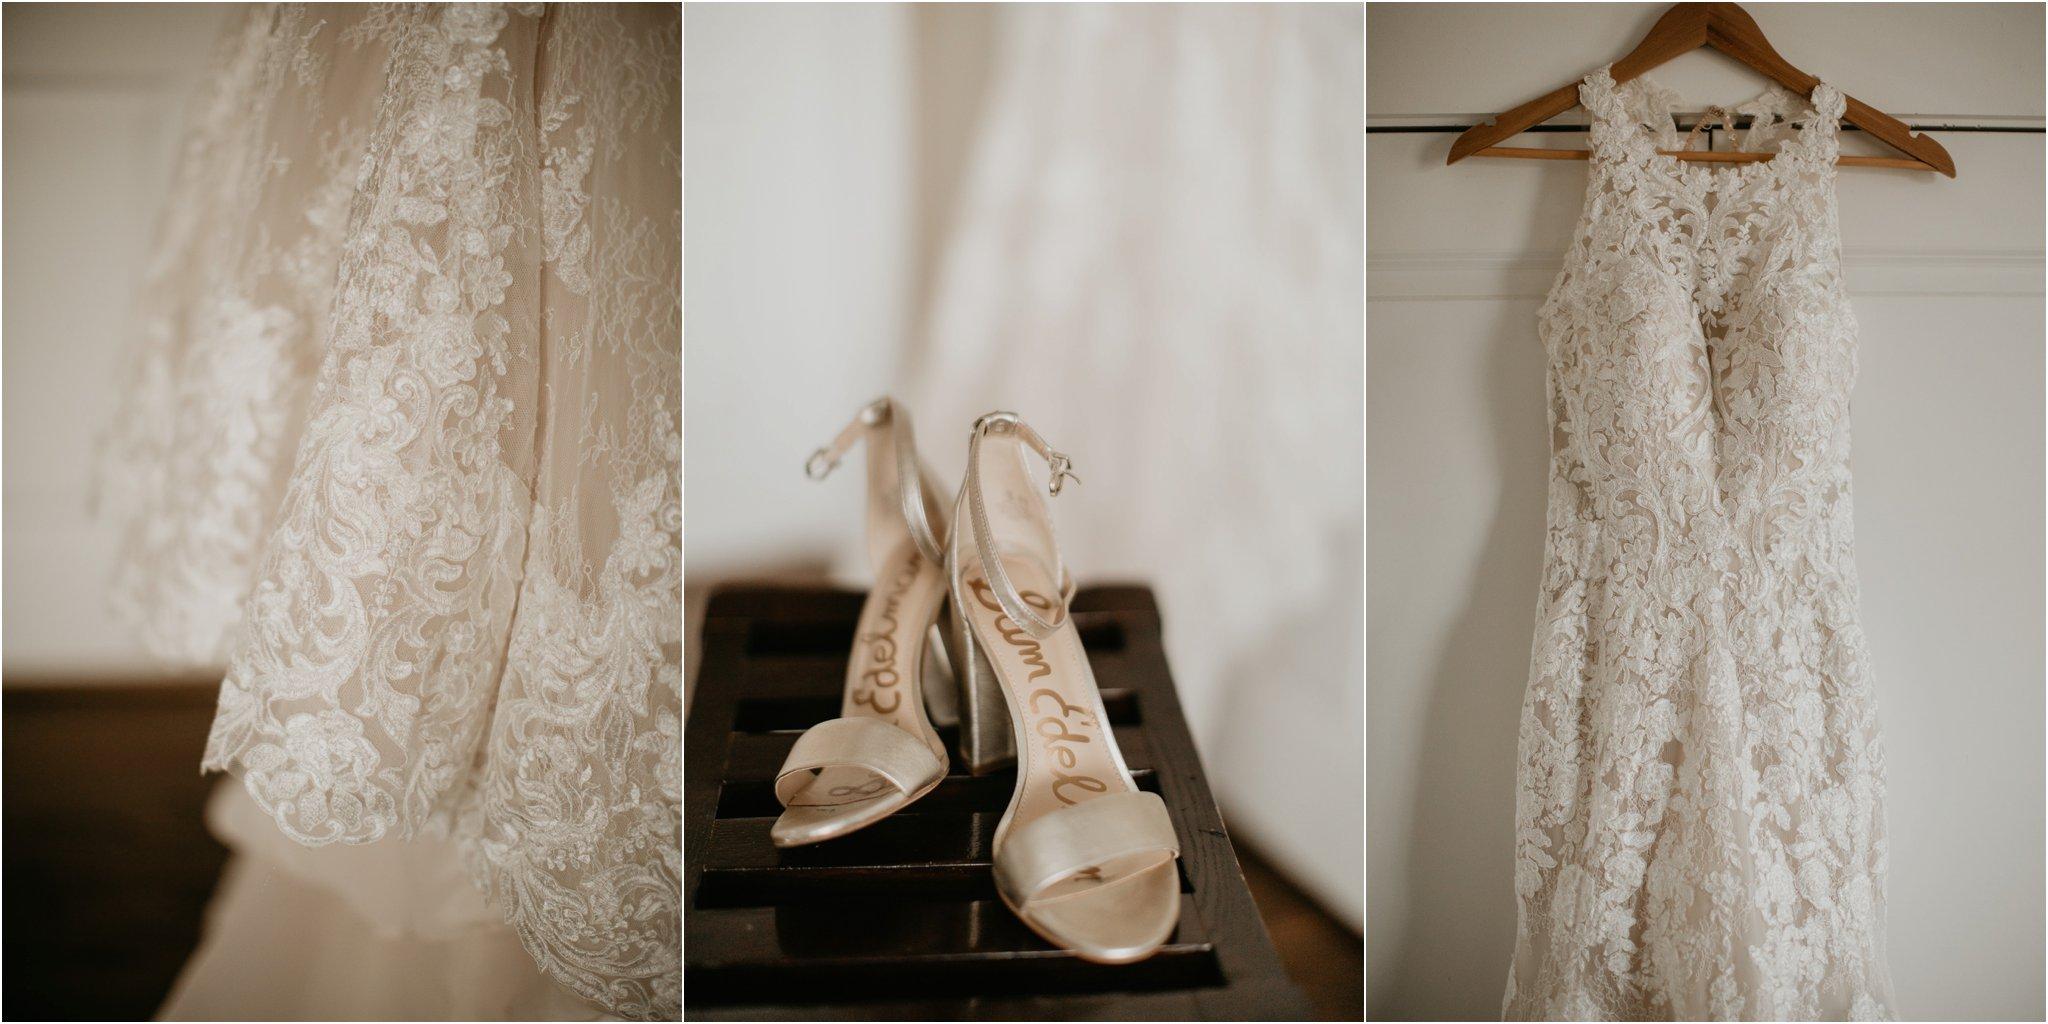 Patrick Henry Ballroom - Weddings - Virginia Wedding Photographer - Pat Cori Photography-1.jpg